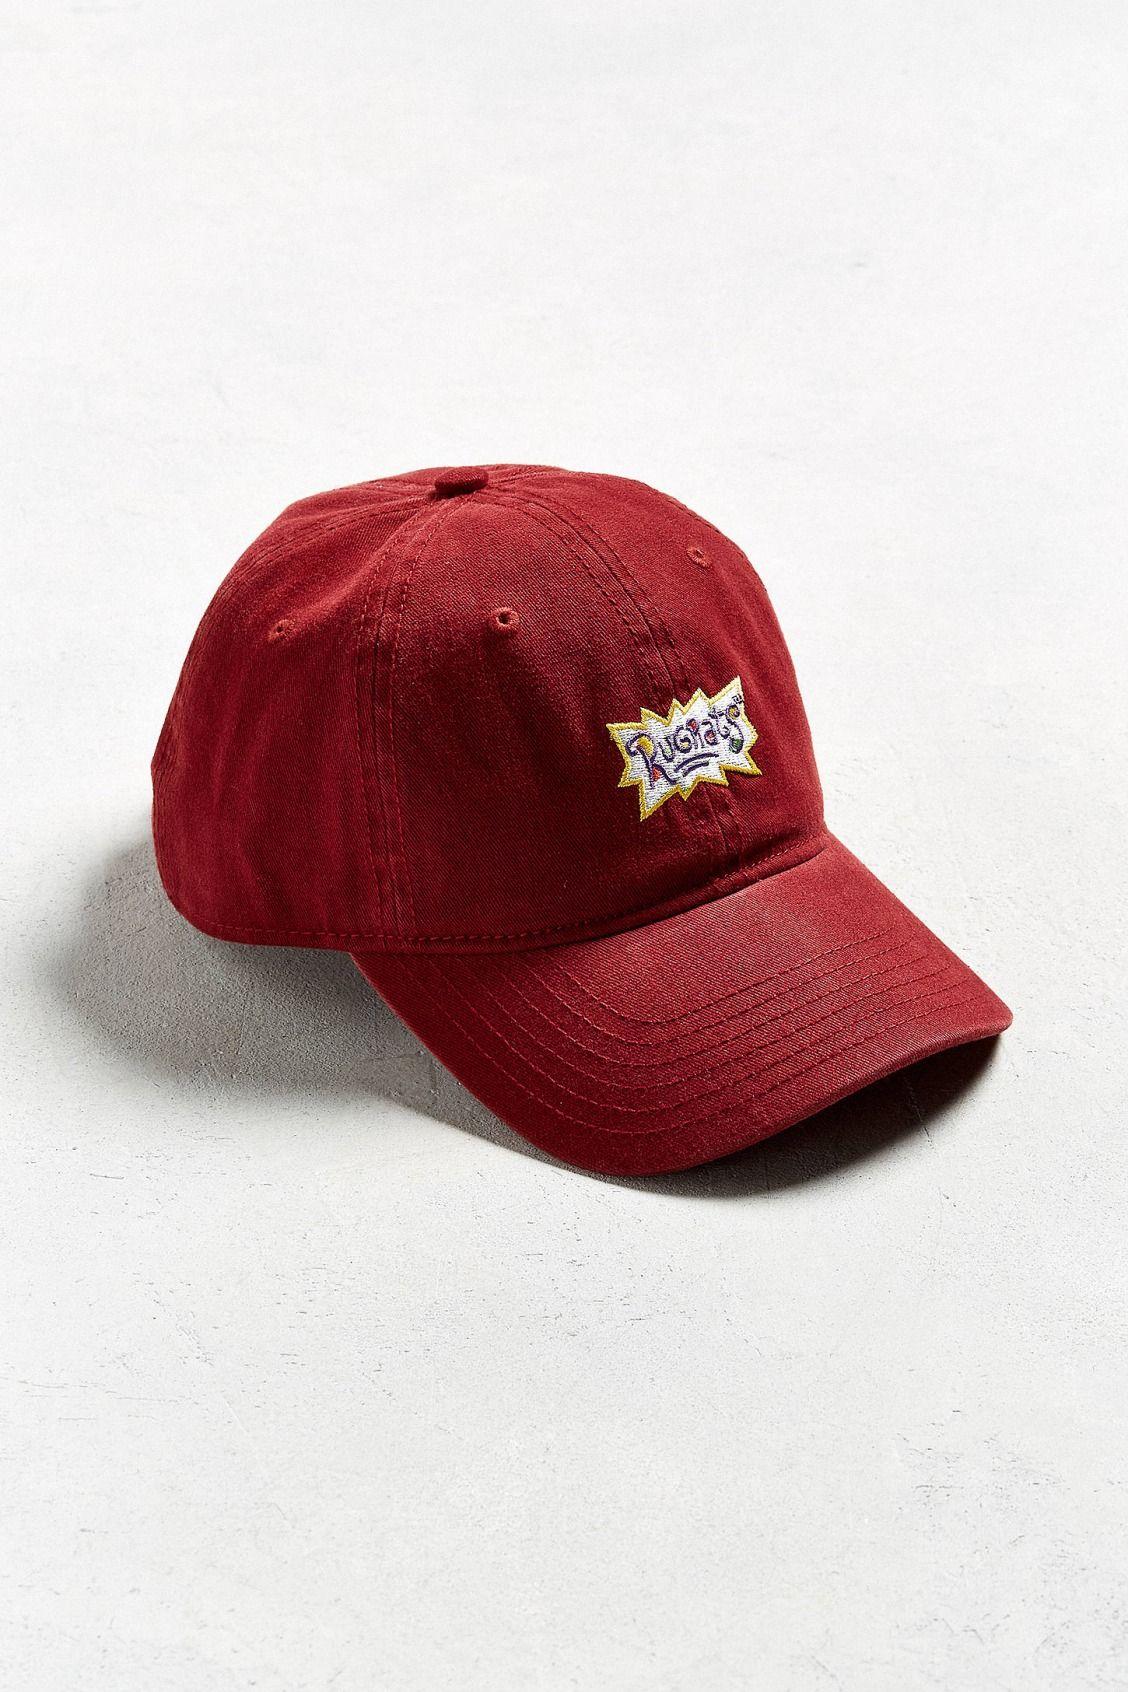 Sombreros Para Papá · Gorras De Camionero · Trajes De Verano · Ideas De  Traje · Rugrats · Gorros · Urban Outfitters · Slide View  1  Rugrats Dad Hat 632f9e40c7e